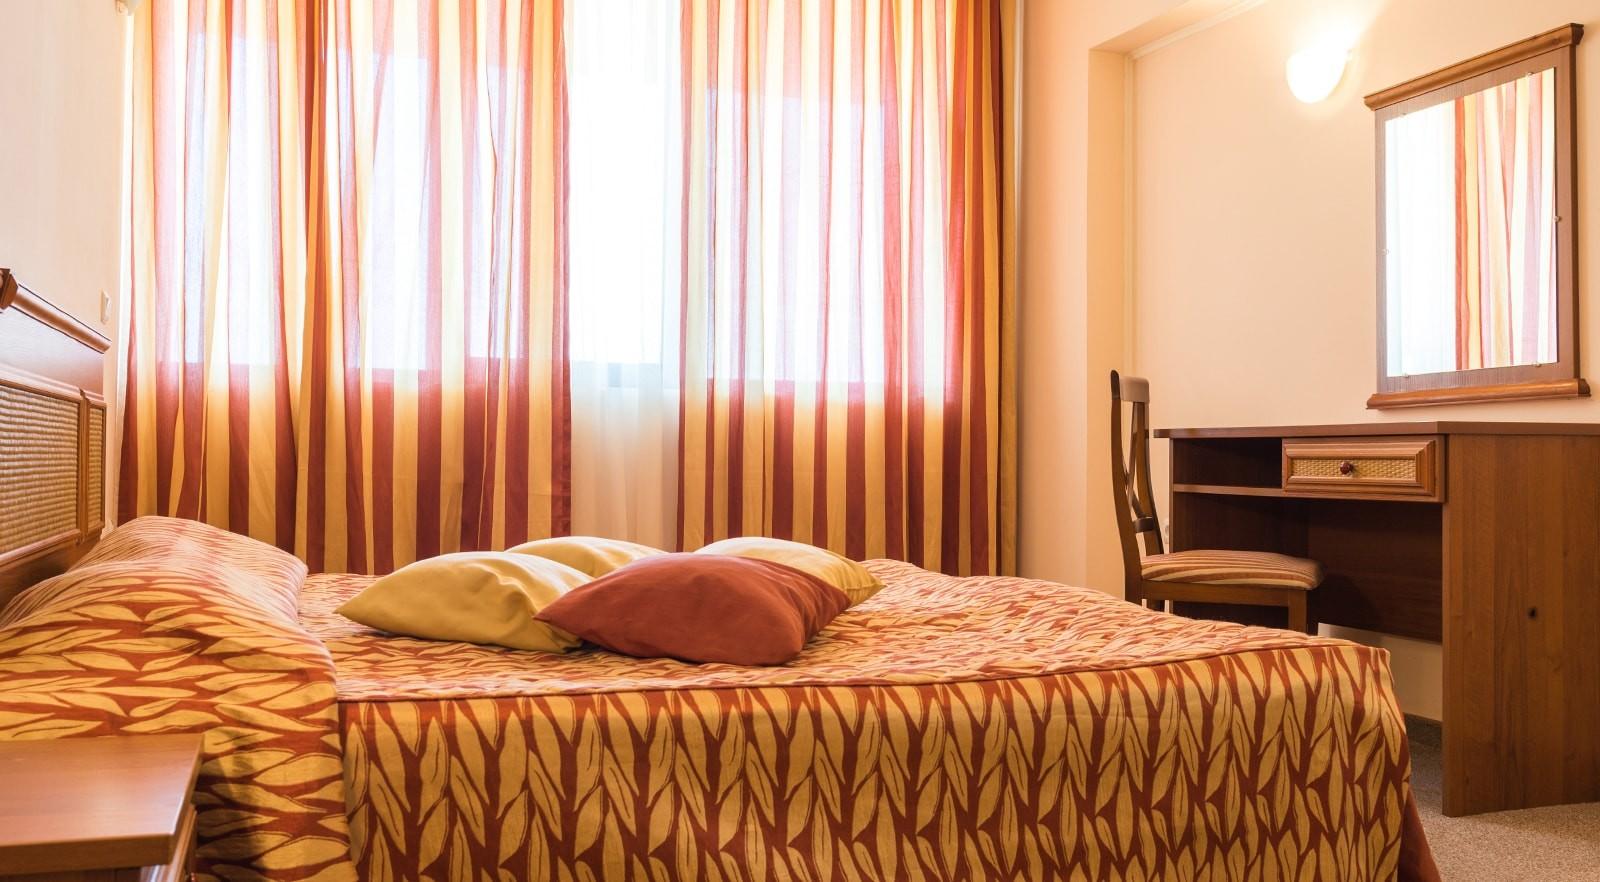 Хотел Цезар Палас 4* - двуспален апартамент